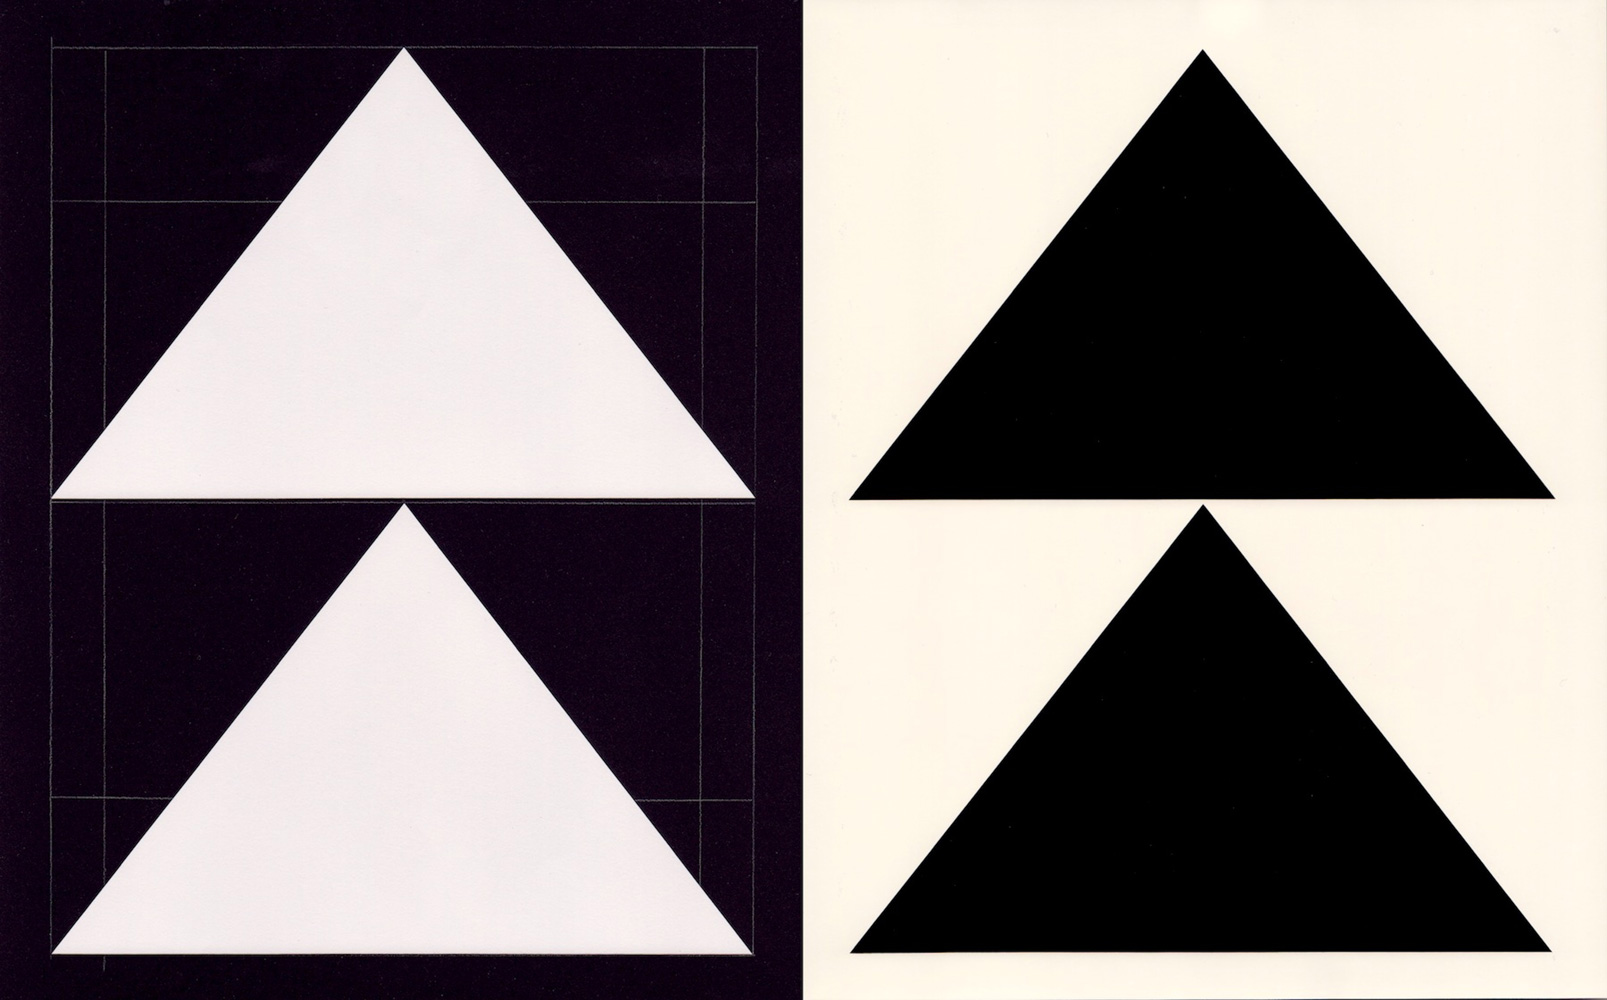 Richard Caldicott  'Untitled #7' 2014  Photogram and black paper negative  25 x 41 cm